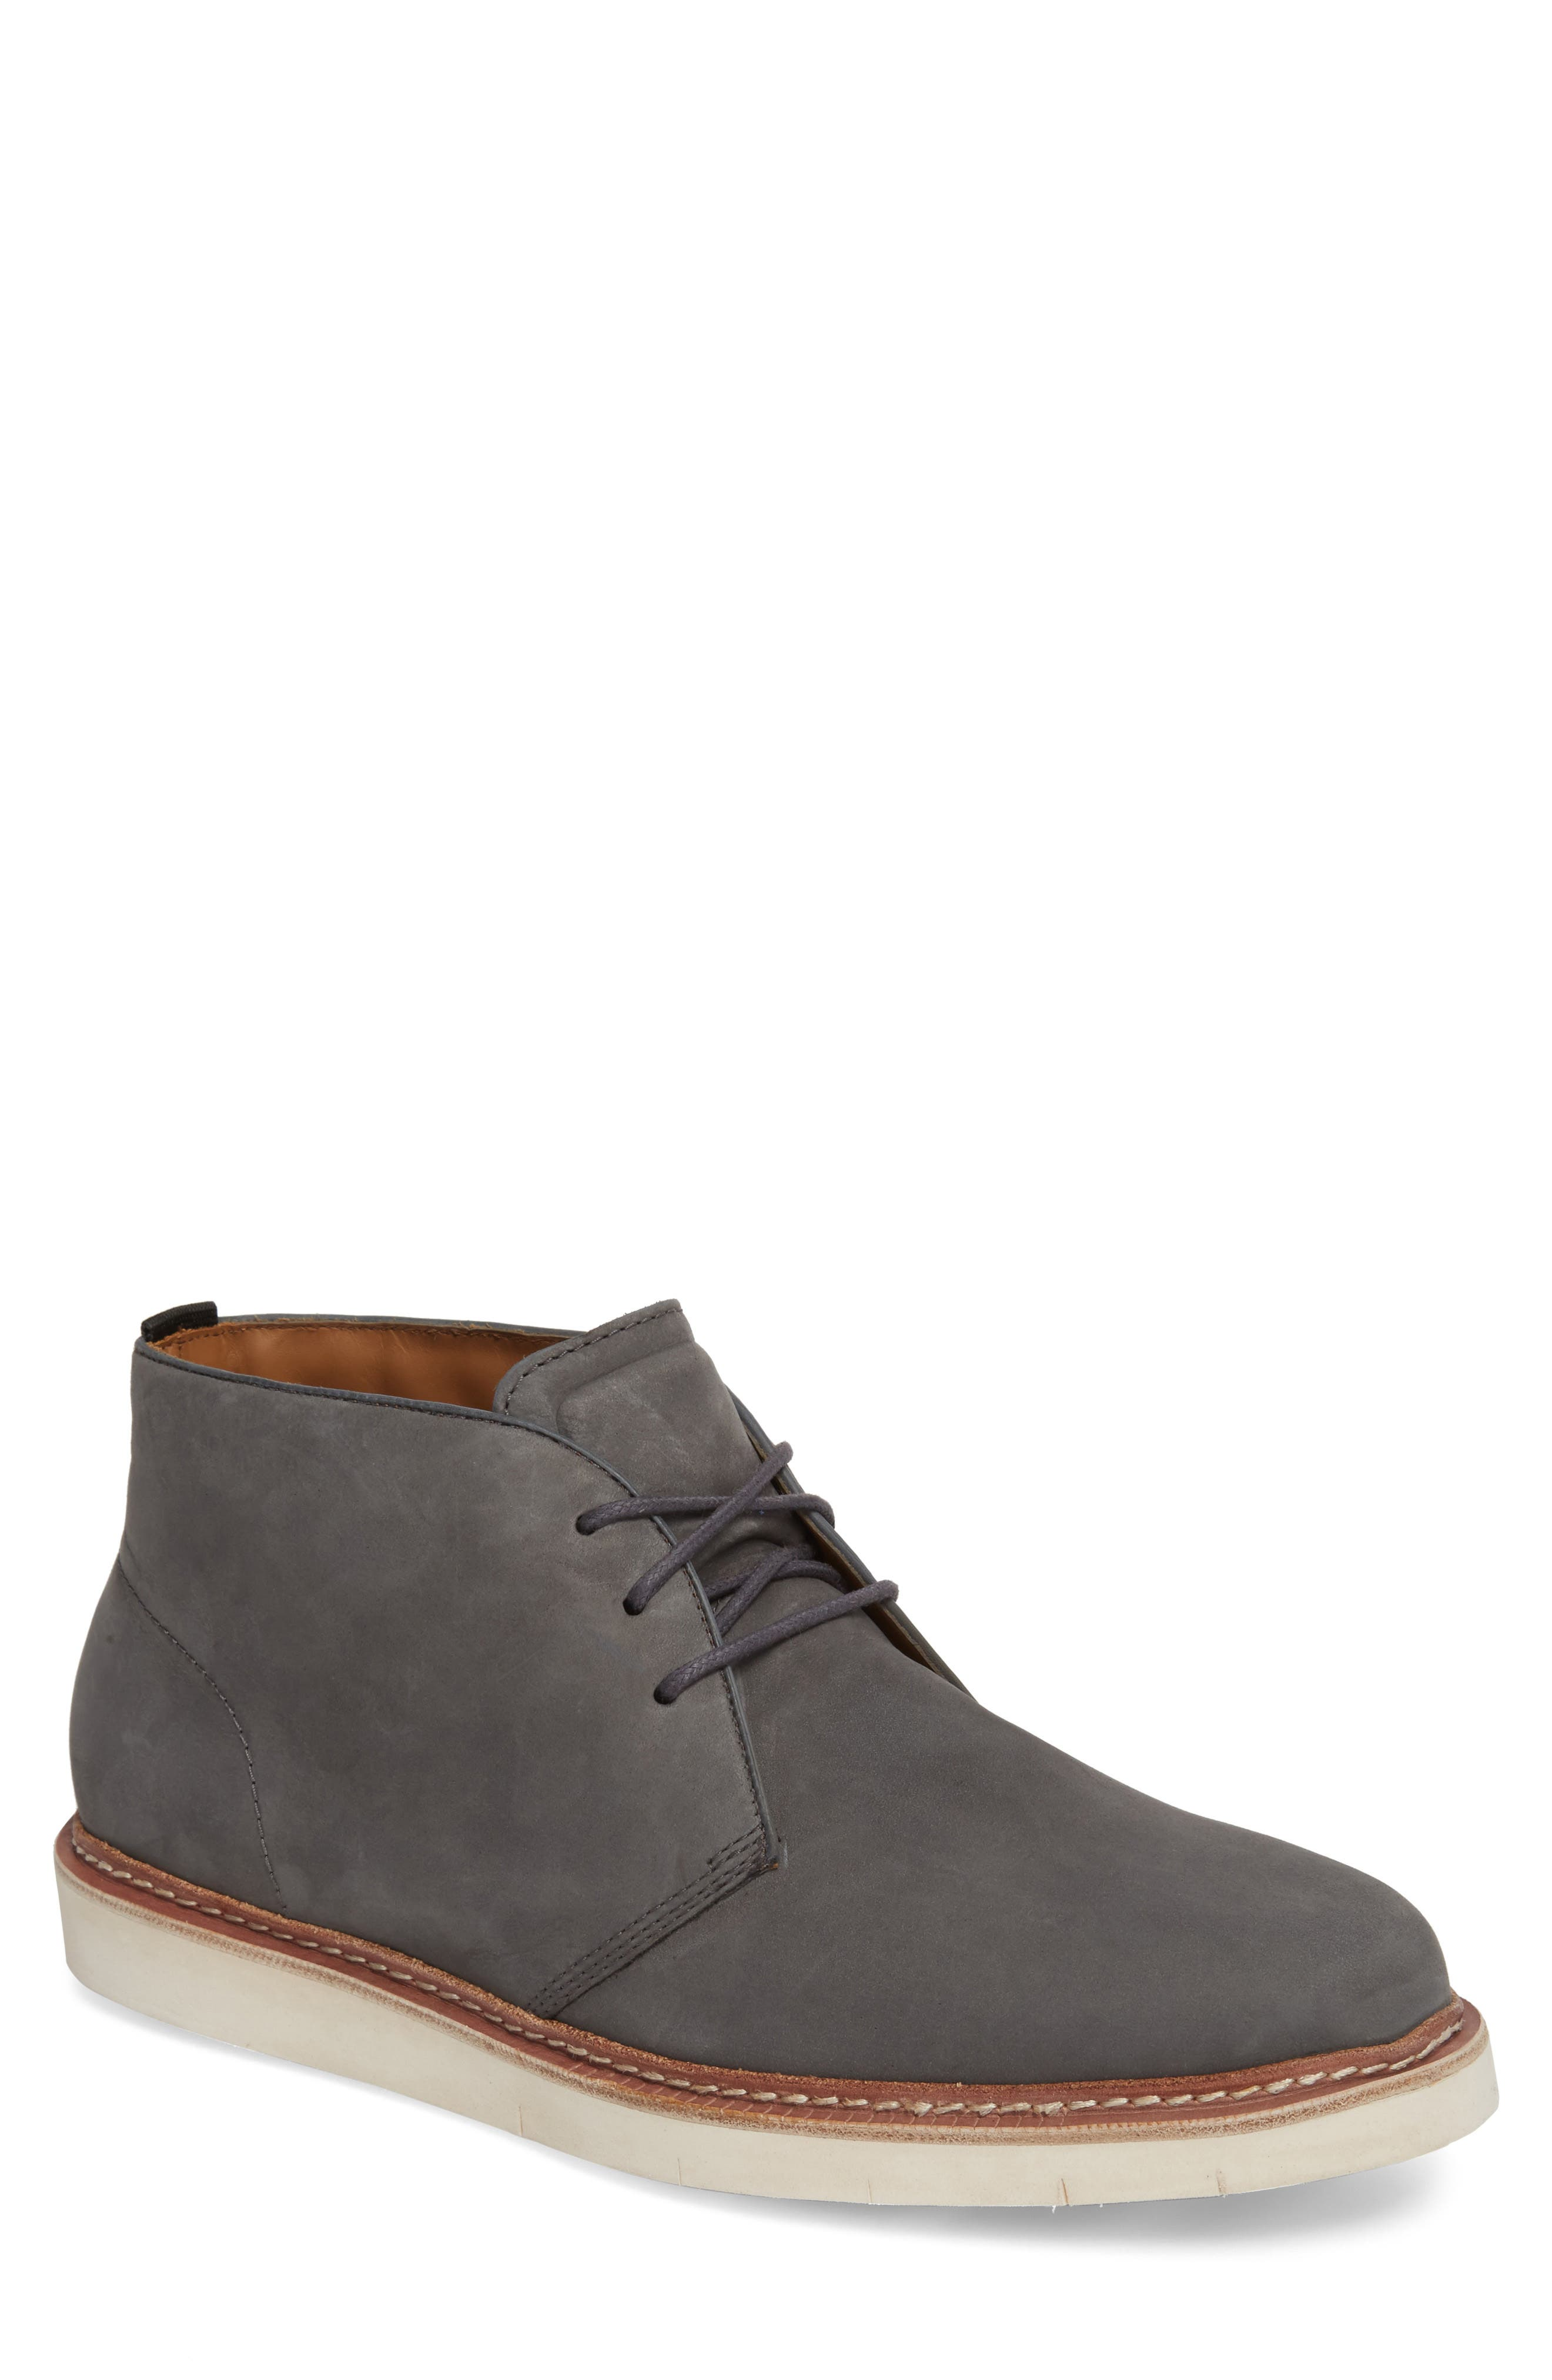 Tanner Chukka Boot,                         Main,                         color, Magnet Gray